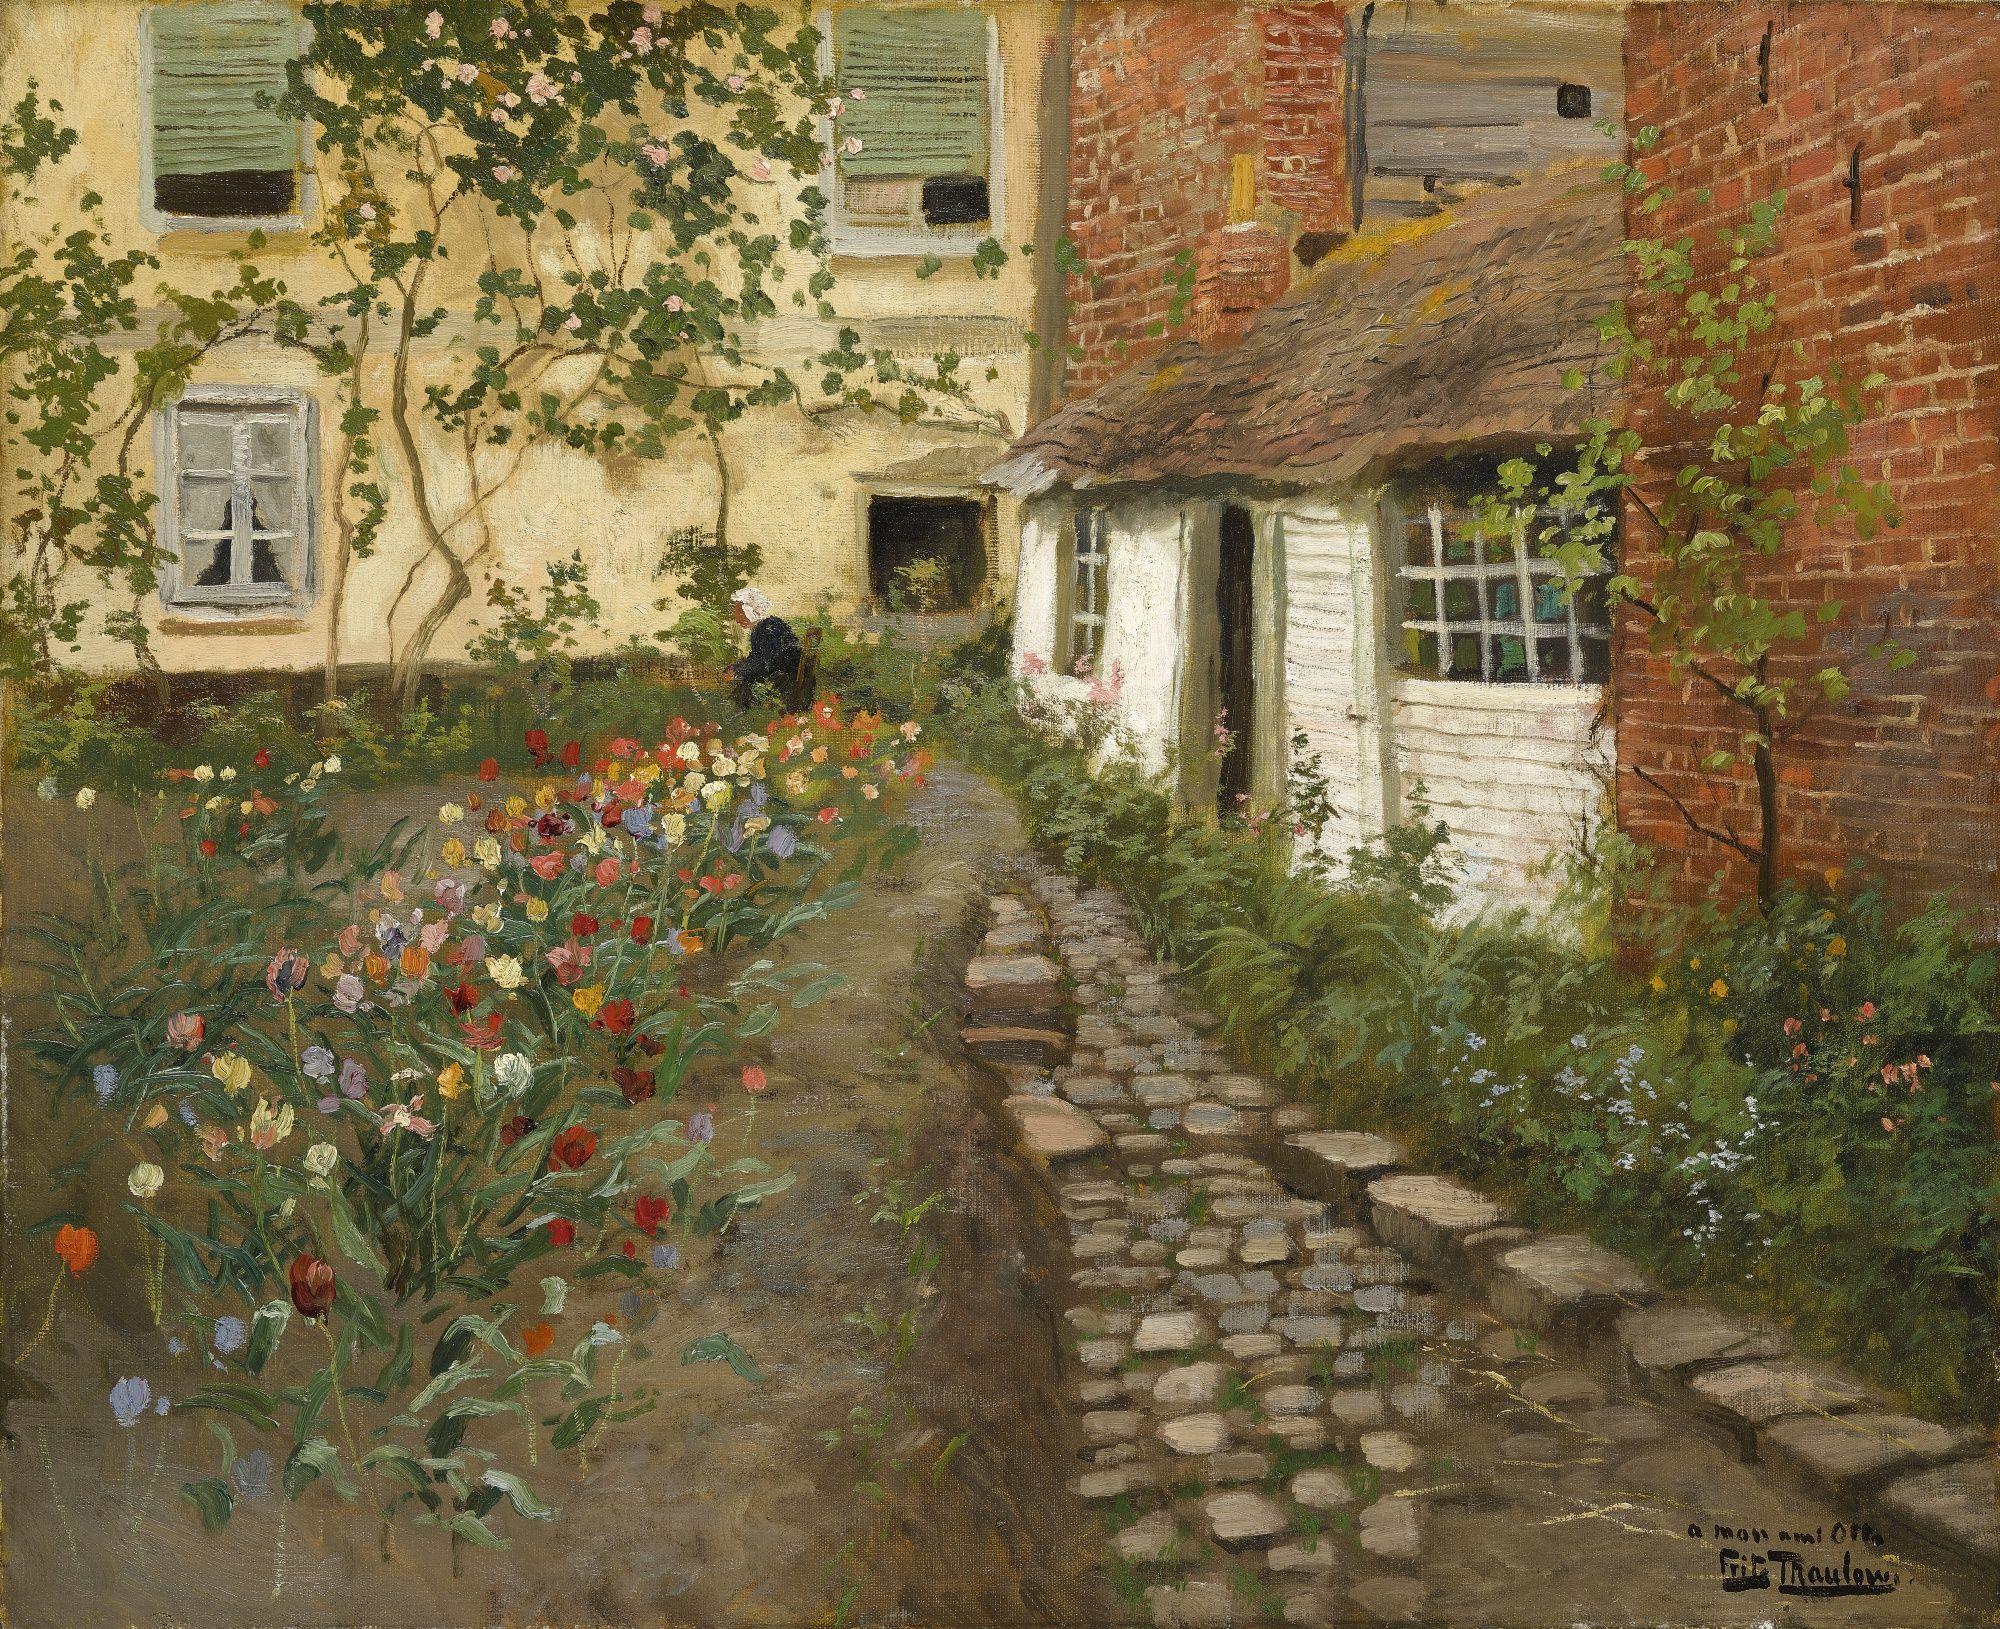 Frits Thaulow - A Garden Path. https://t.co/tMnLJzVs2f